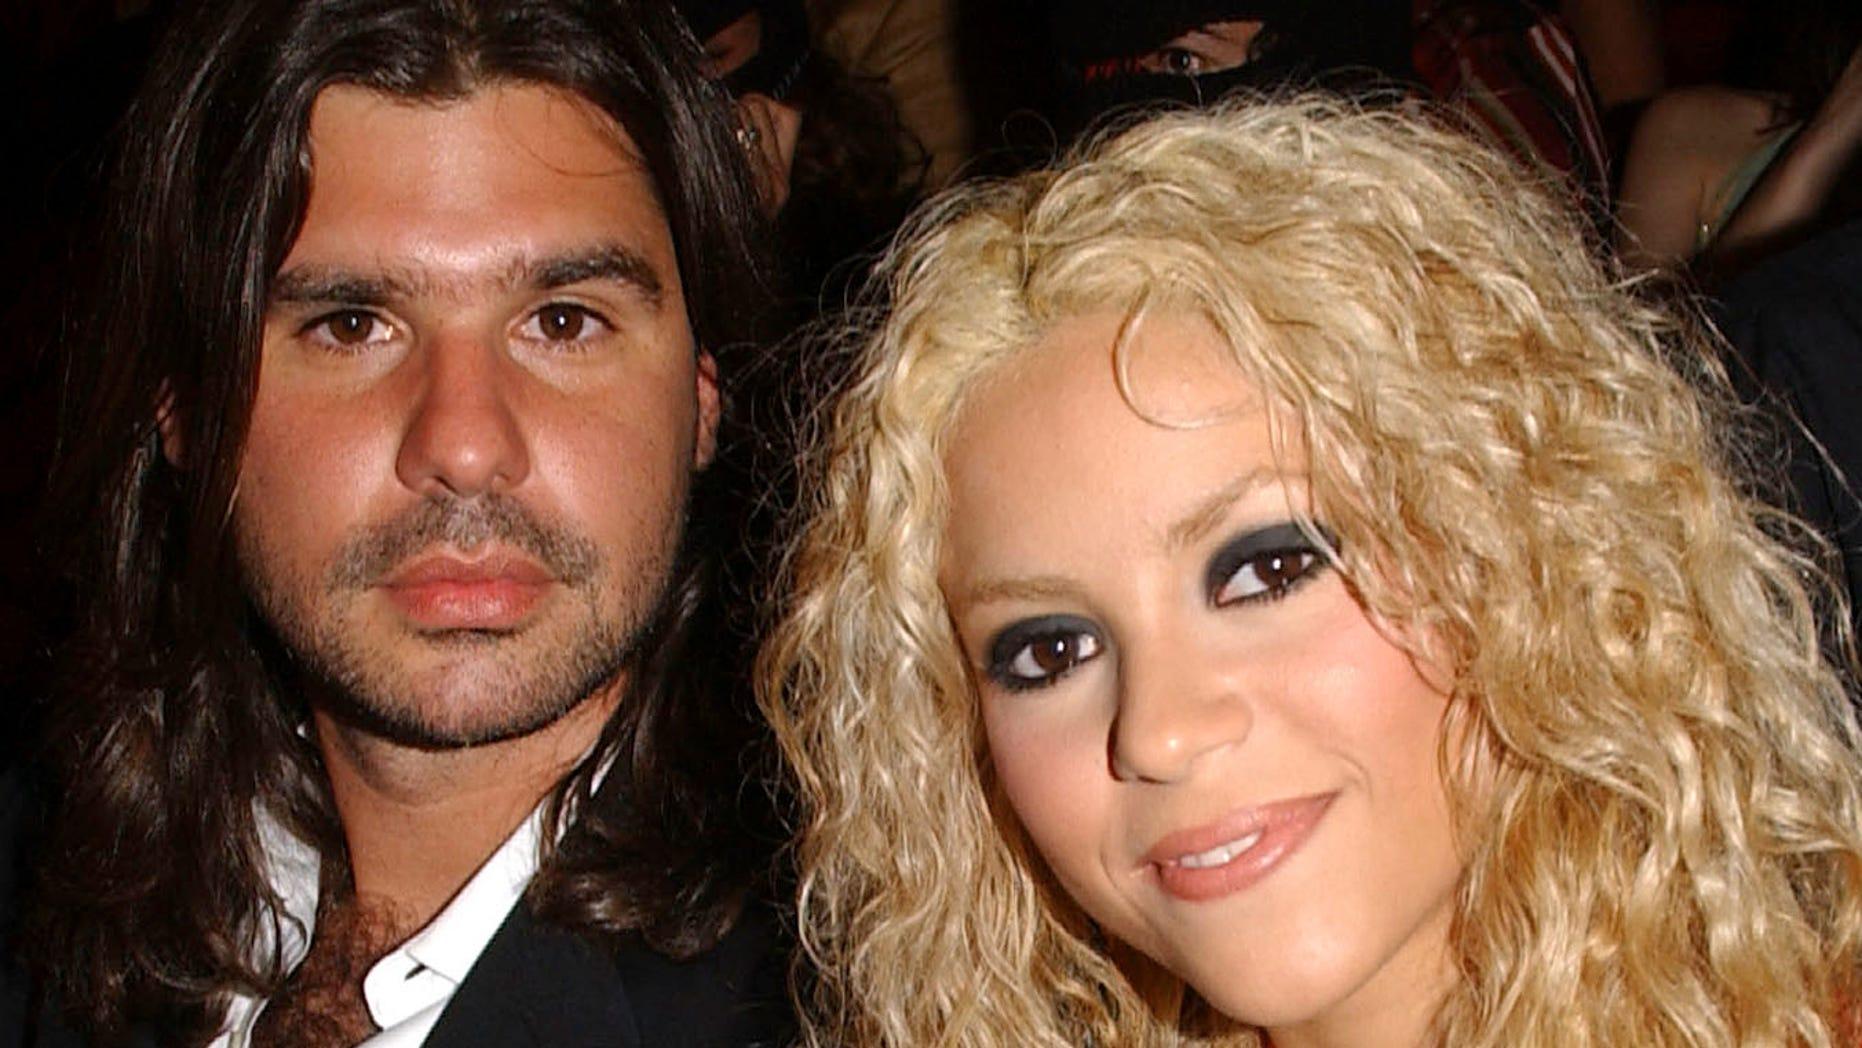 Sharika and boyfriend Antonio de la Rua in the audience at the 2002 MTV Video Music Awards Latin America at the Jackie Gleason Theater in Miami Beach, Florida, 10/24/02.  Photo by Frank Micelotta/ImageDirect.